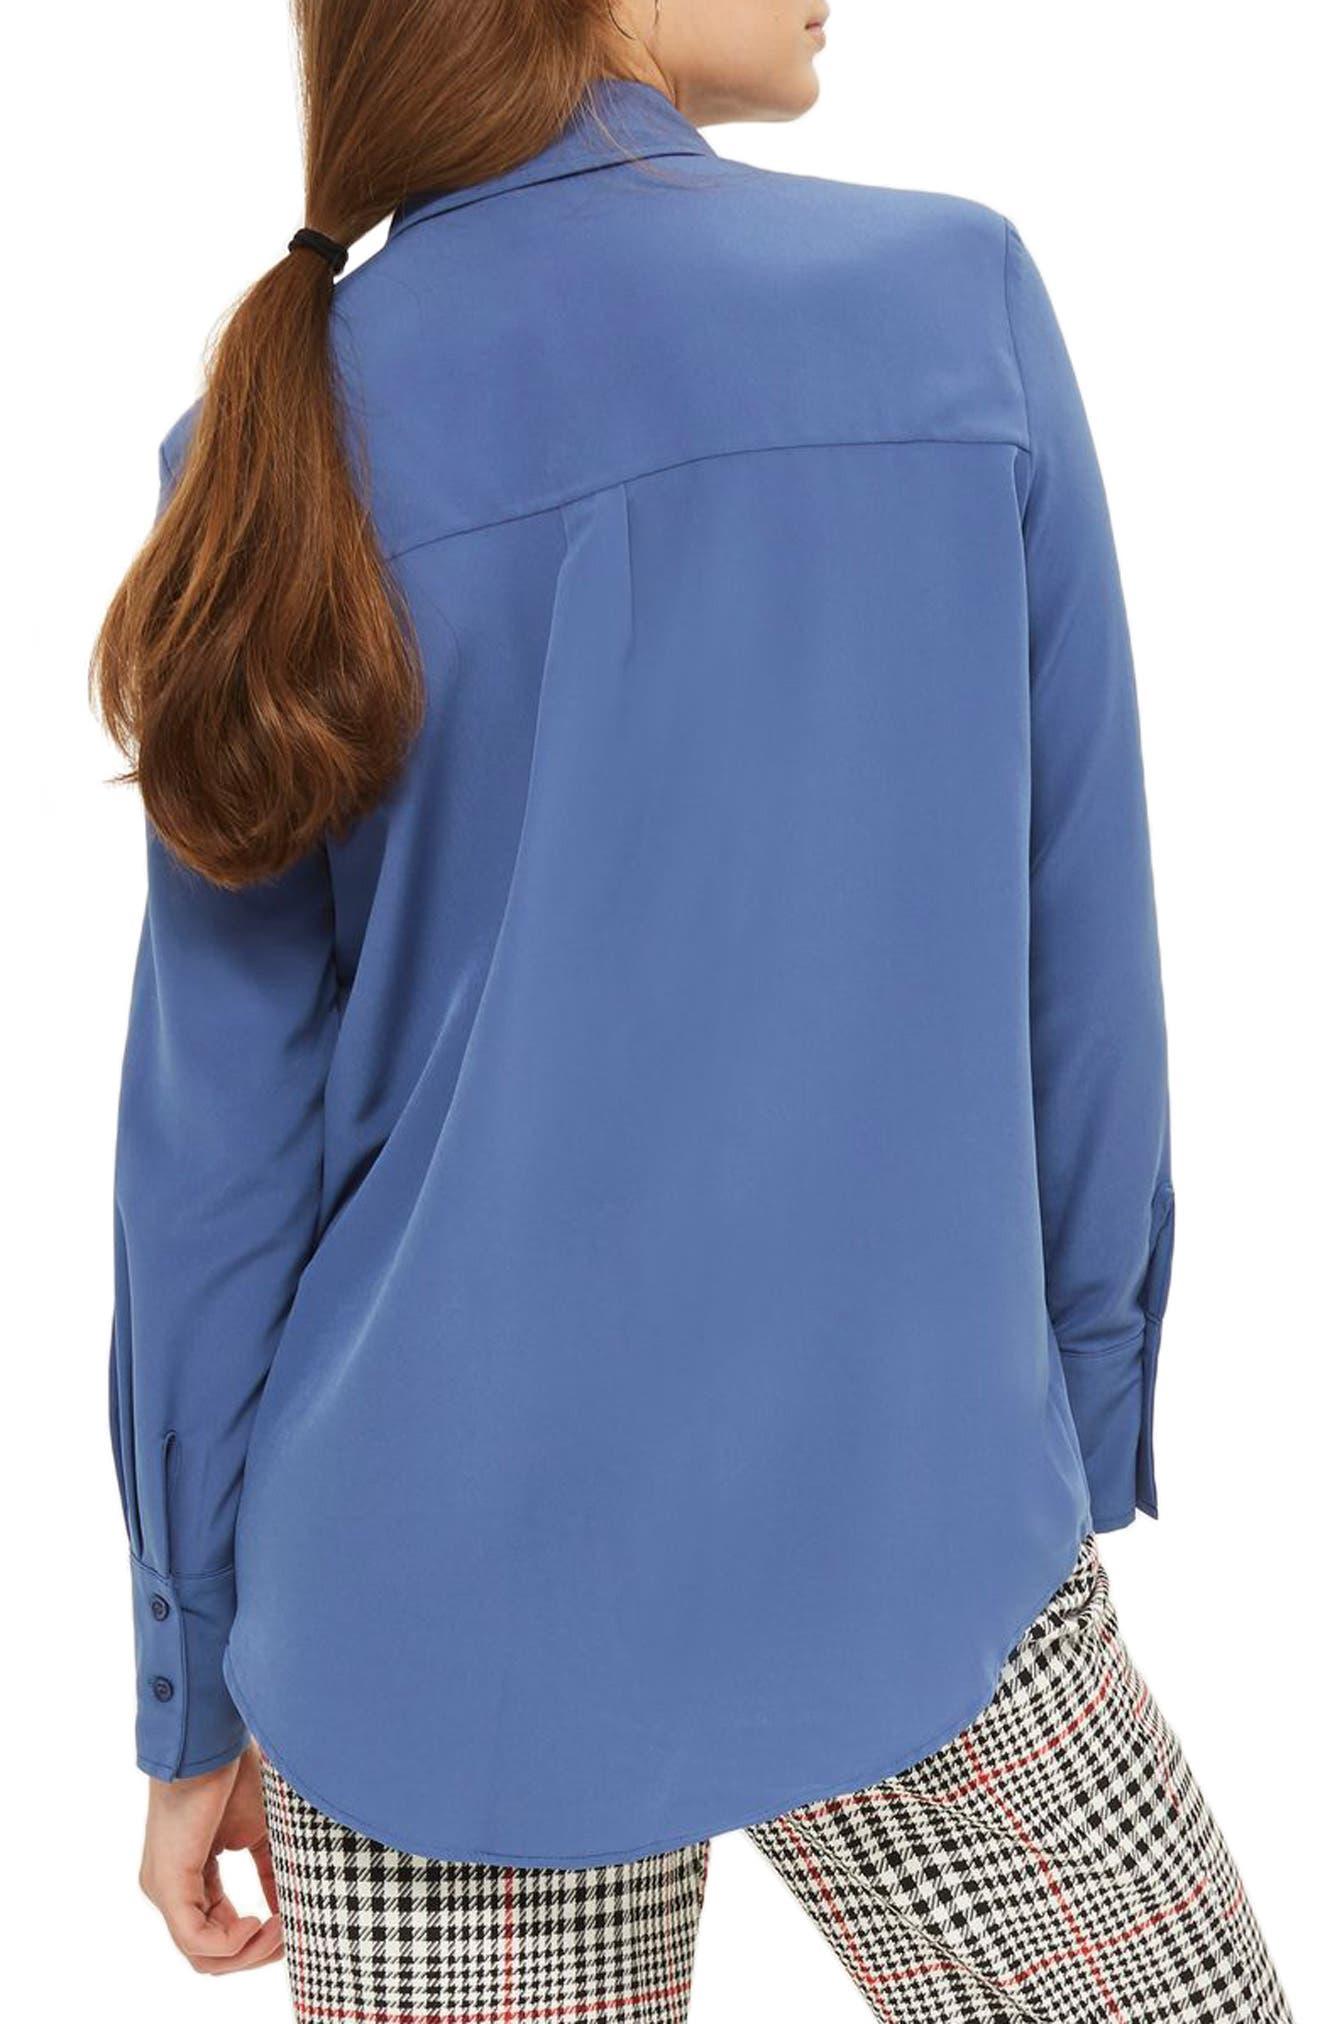 '70s Collar Shirt,                             Alternate thumbnail 2, color,                             400